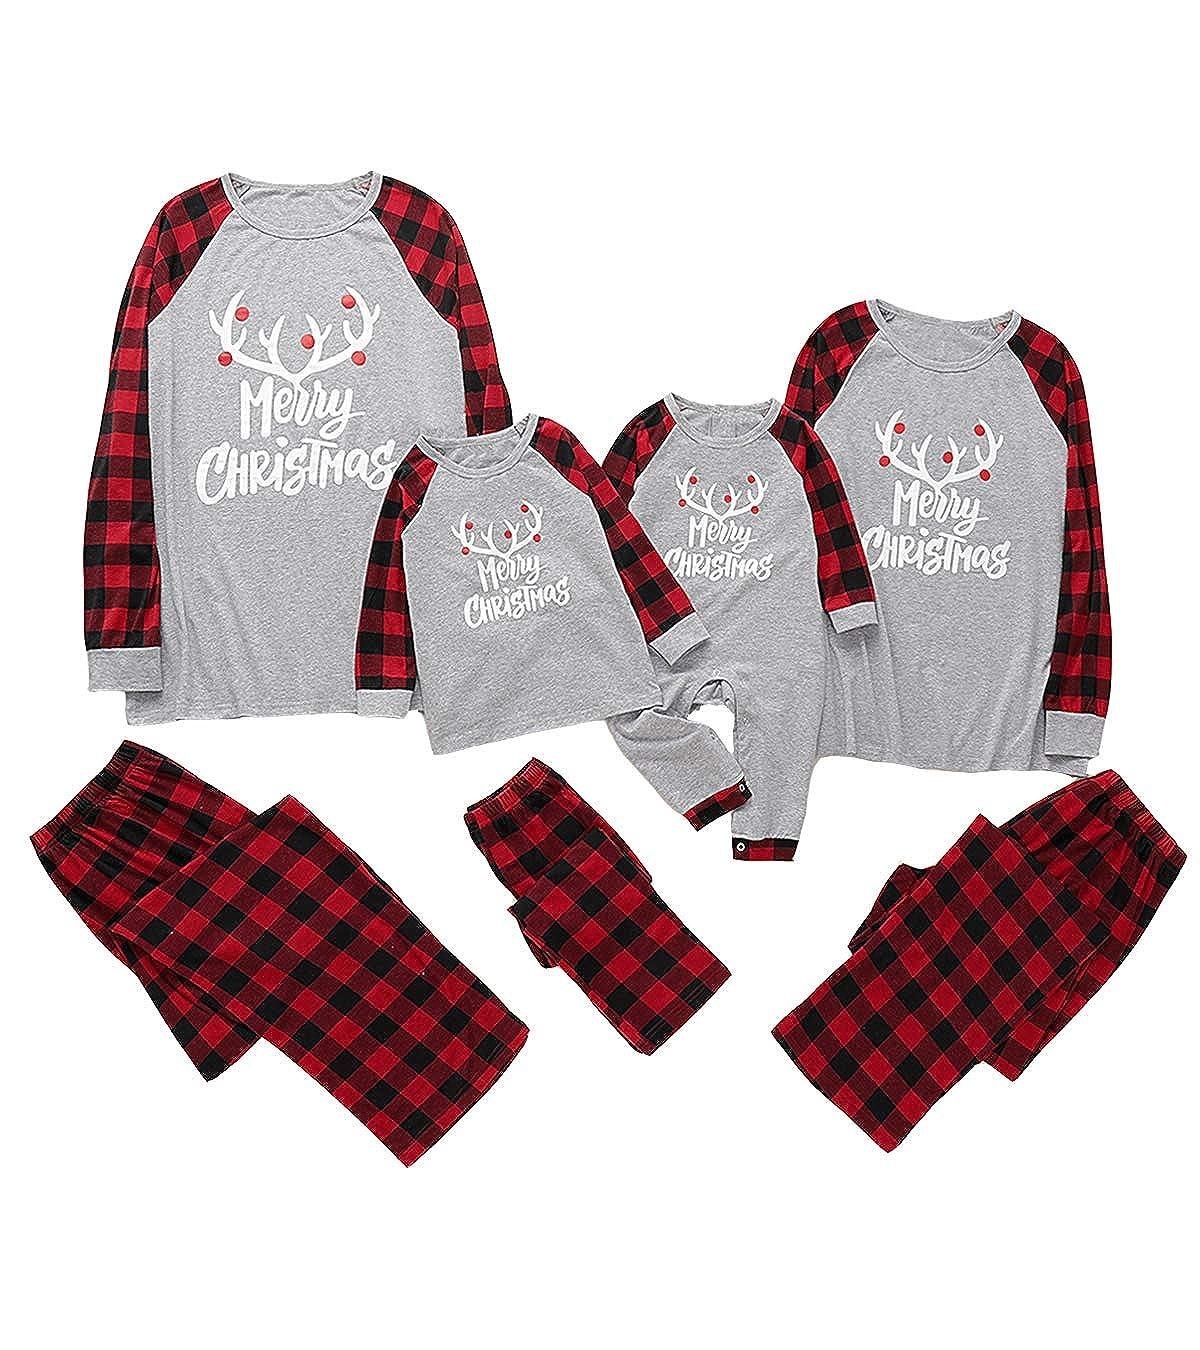 Happidoo Christmas Family Matching Pajamas Set Funny Deer Plaid Long Sleeve Tee and Pants Loungewear